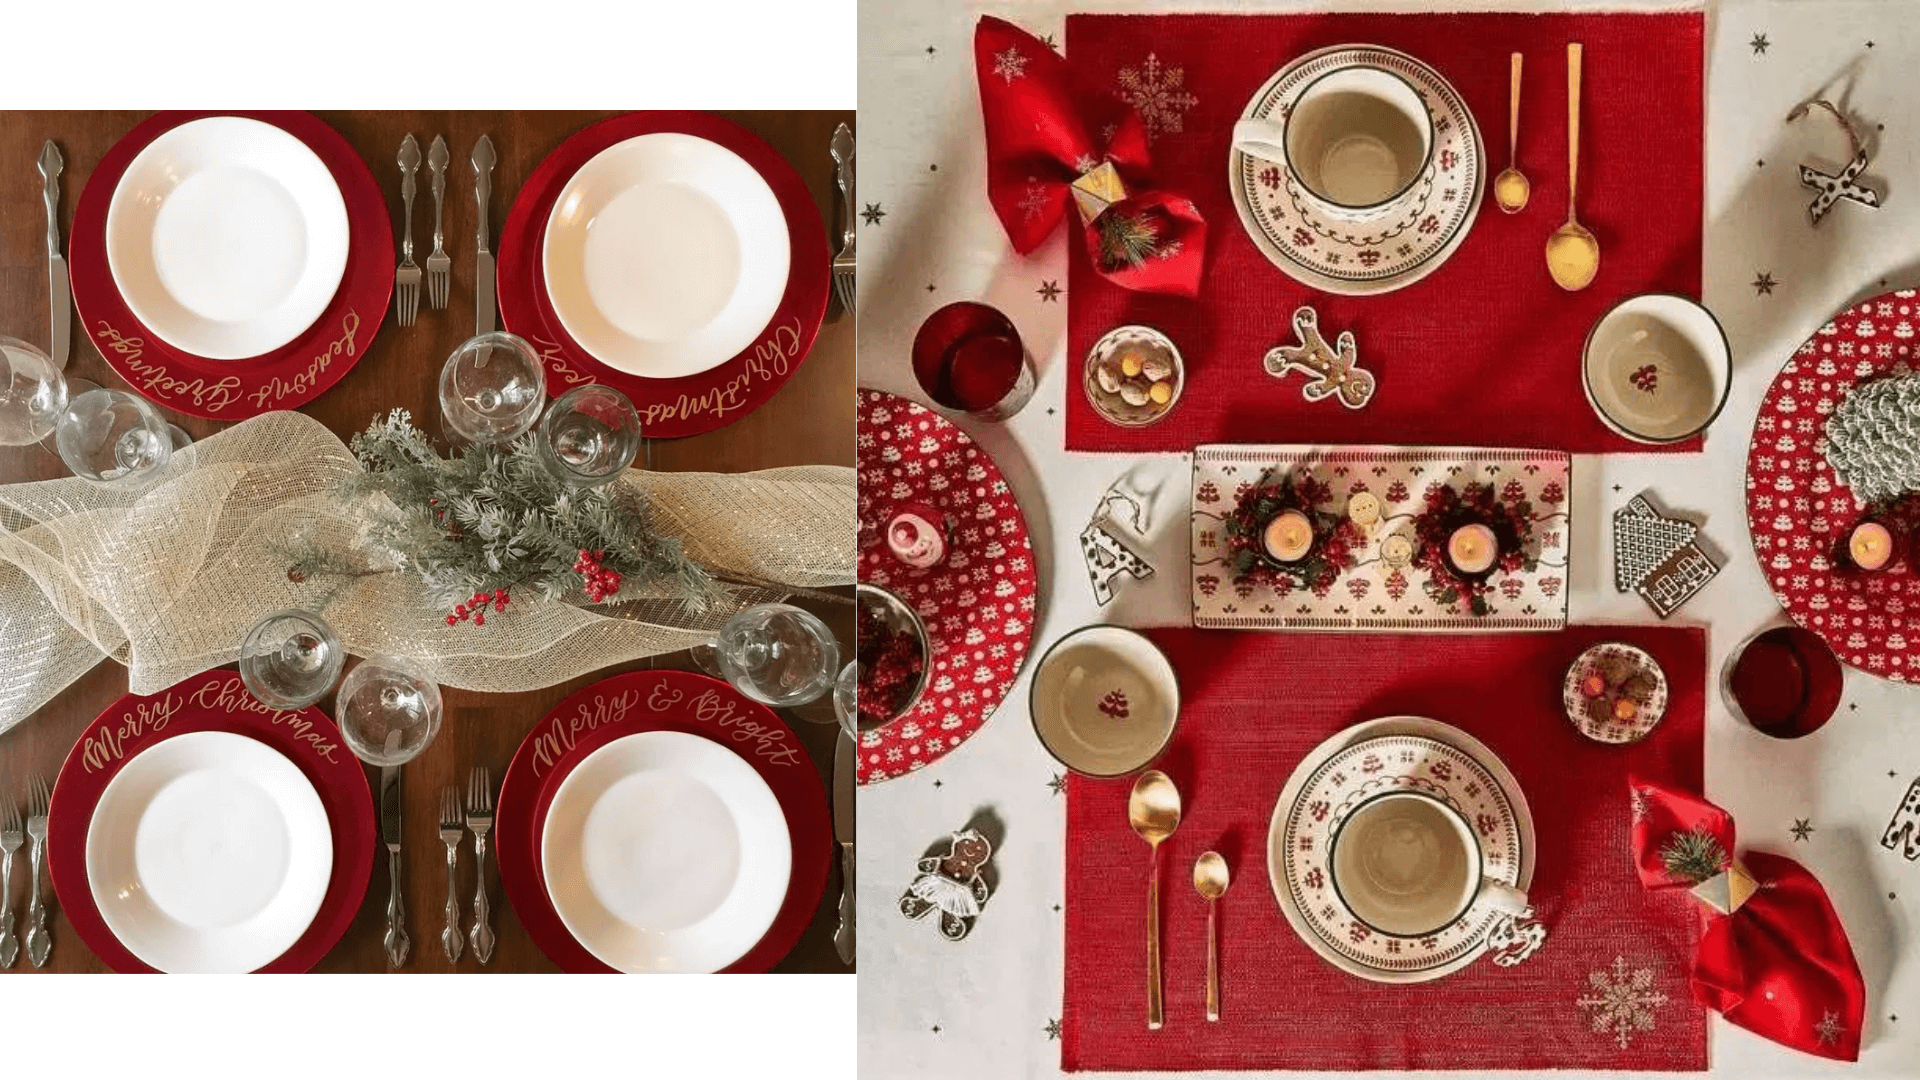 Christmas red tableware